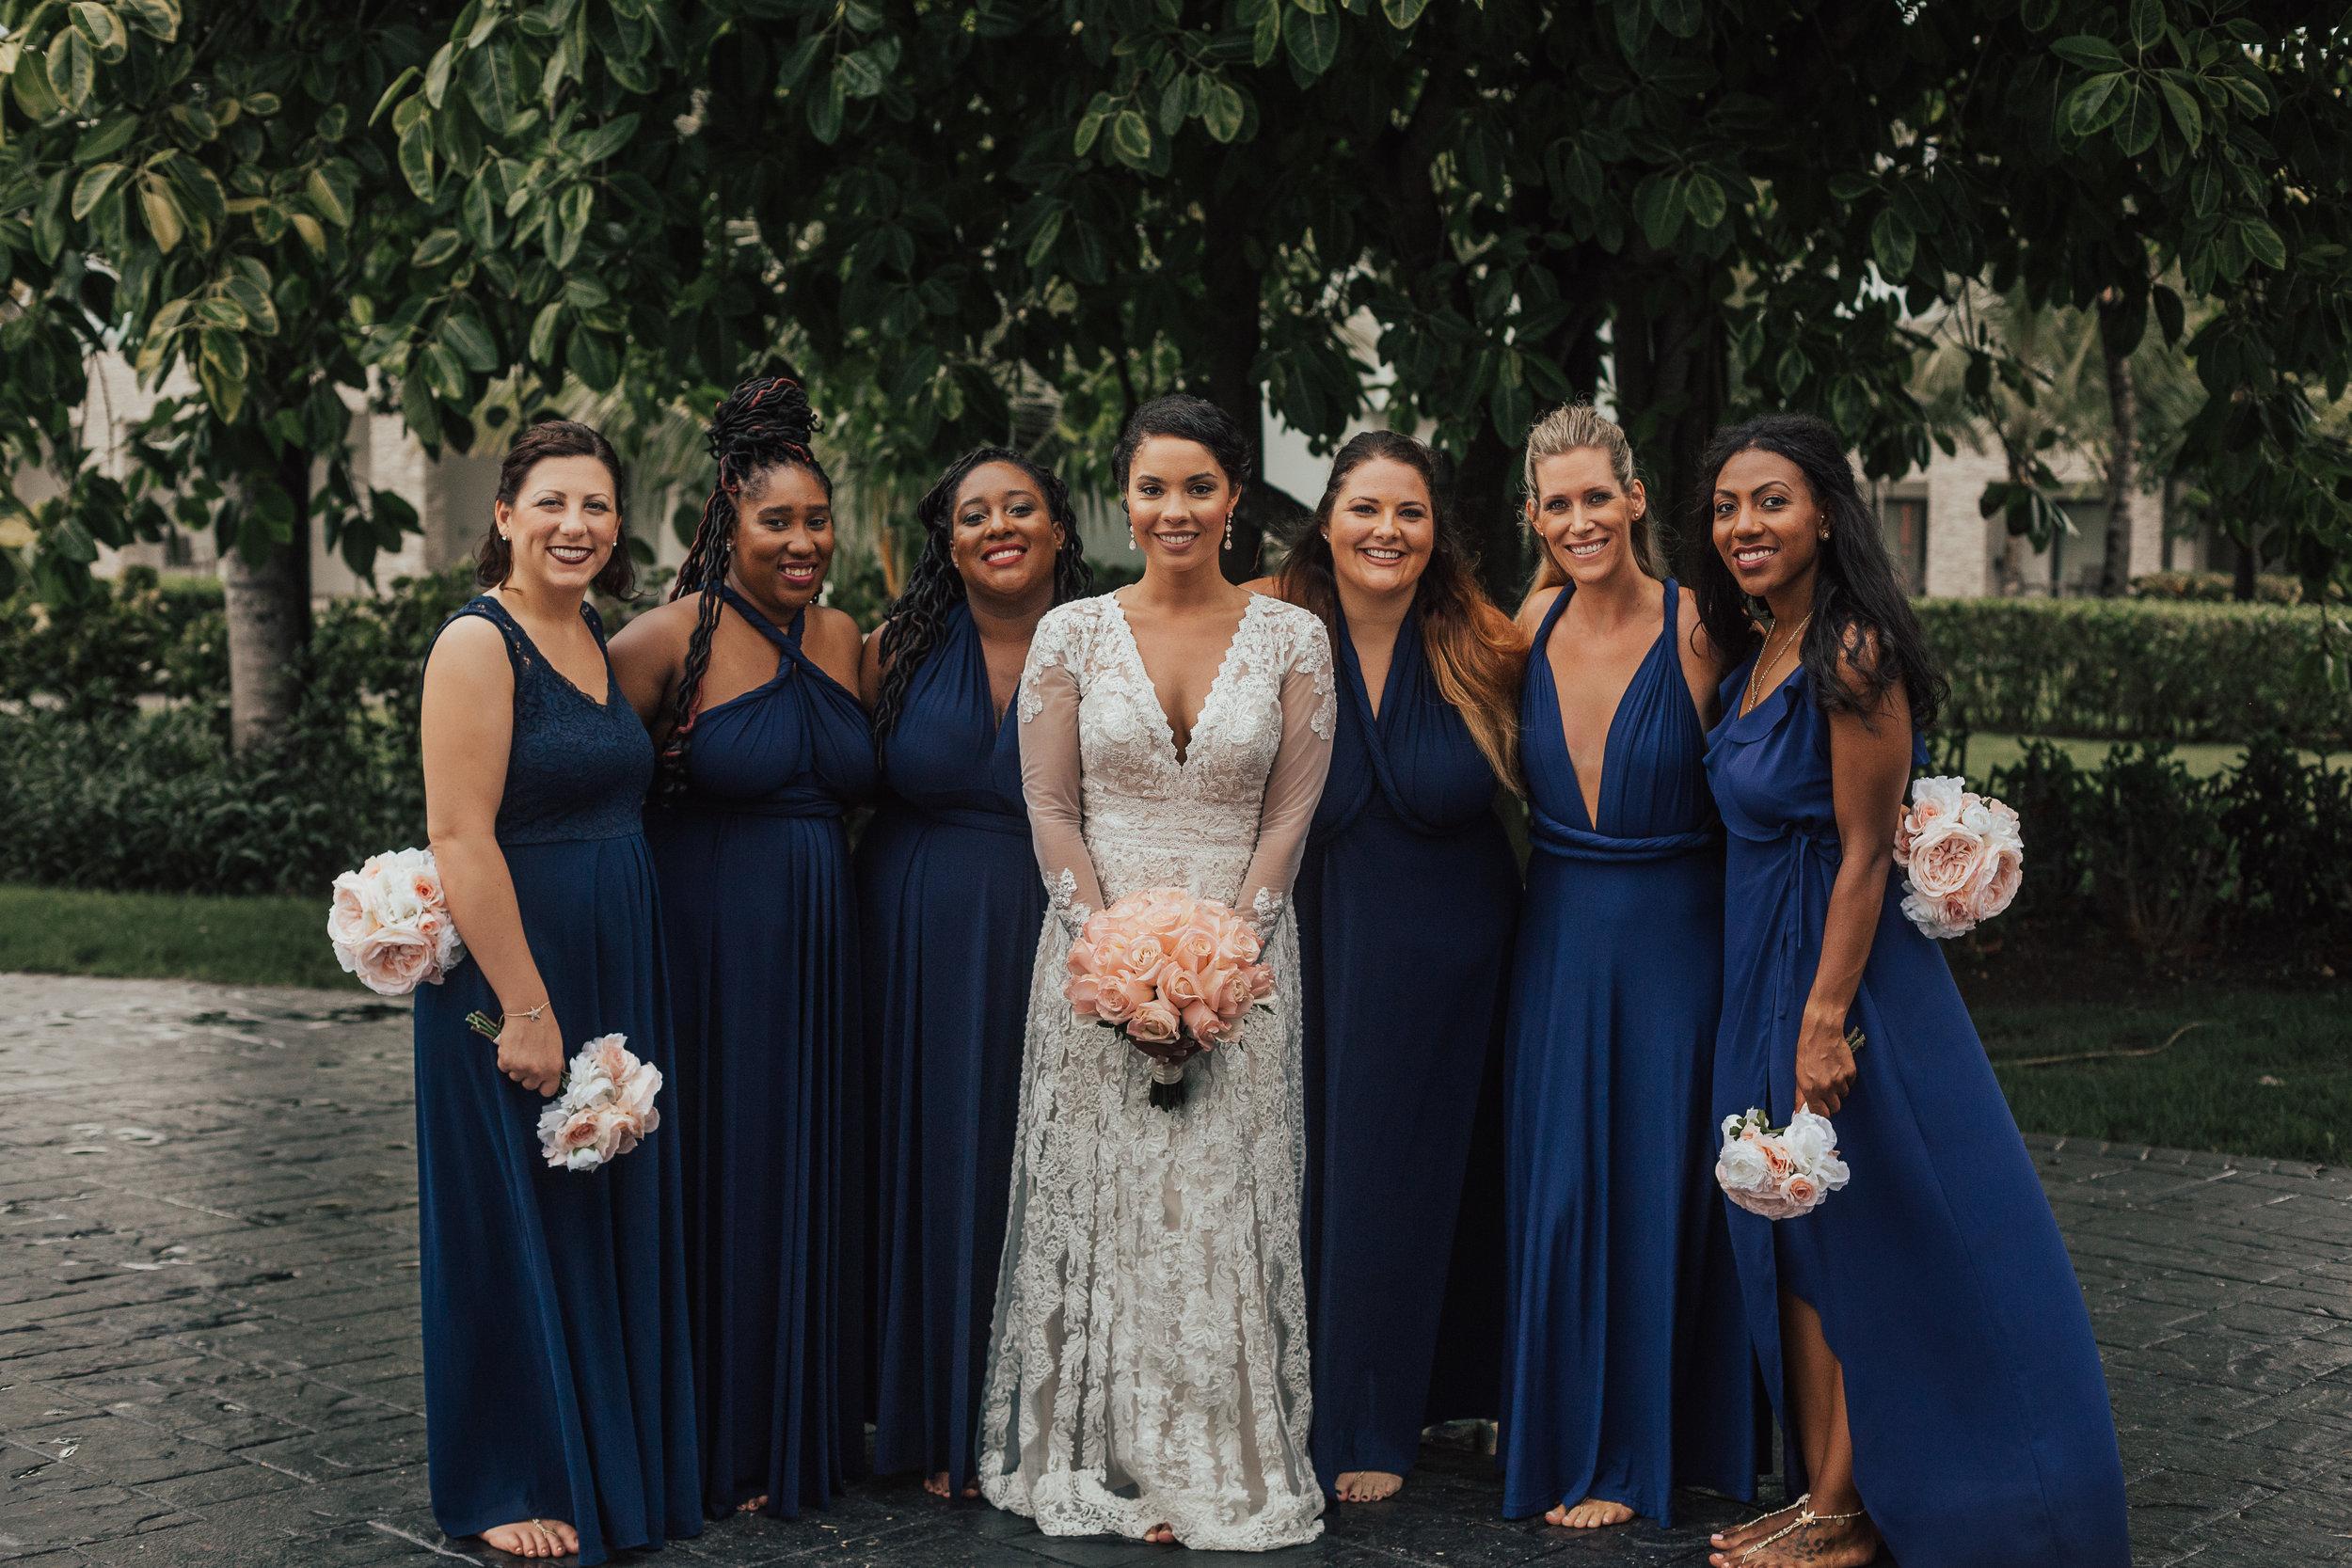 Destination-Wedding-Photographer-cleveland-wedding-photographer-punta-cana-chic-resort